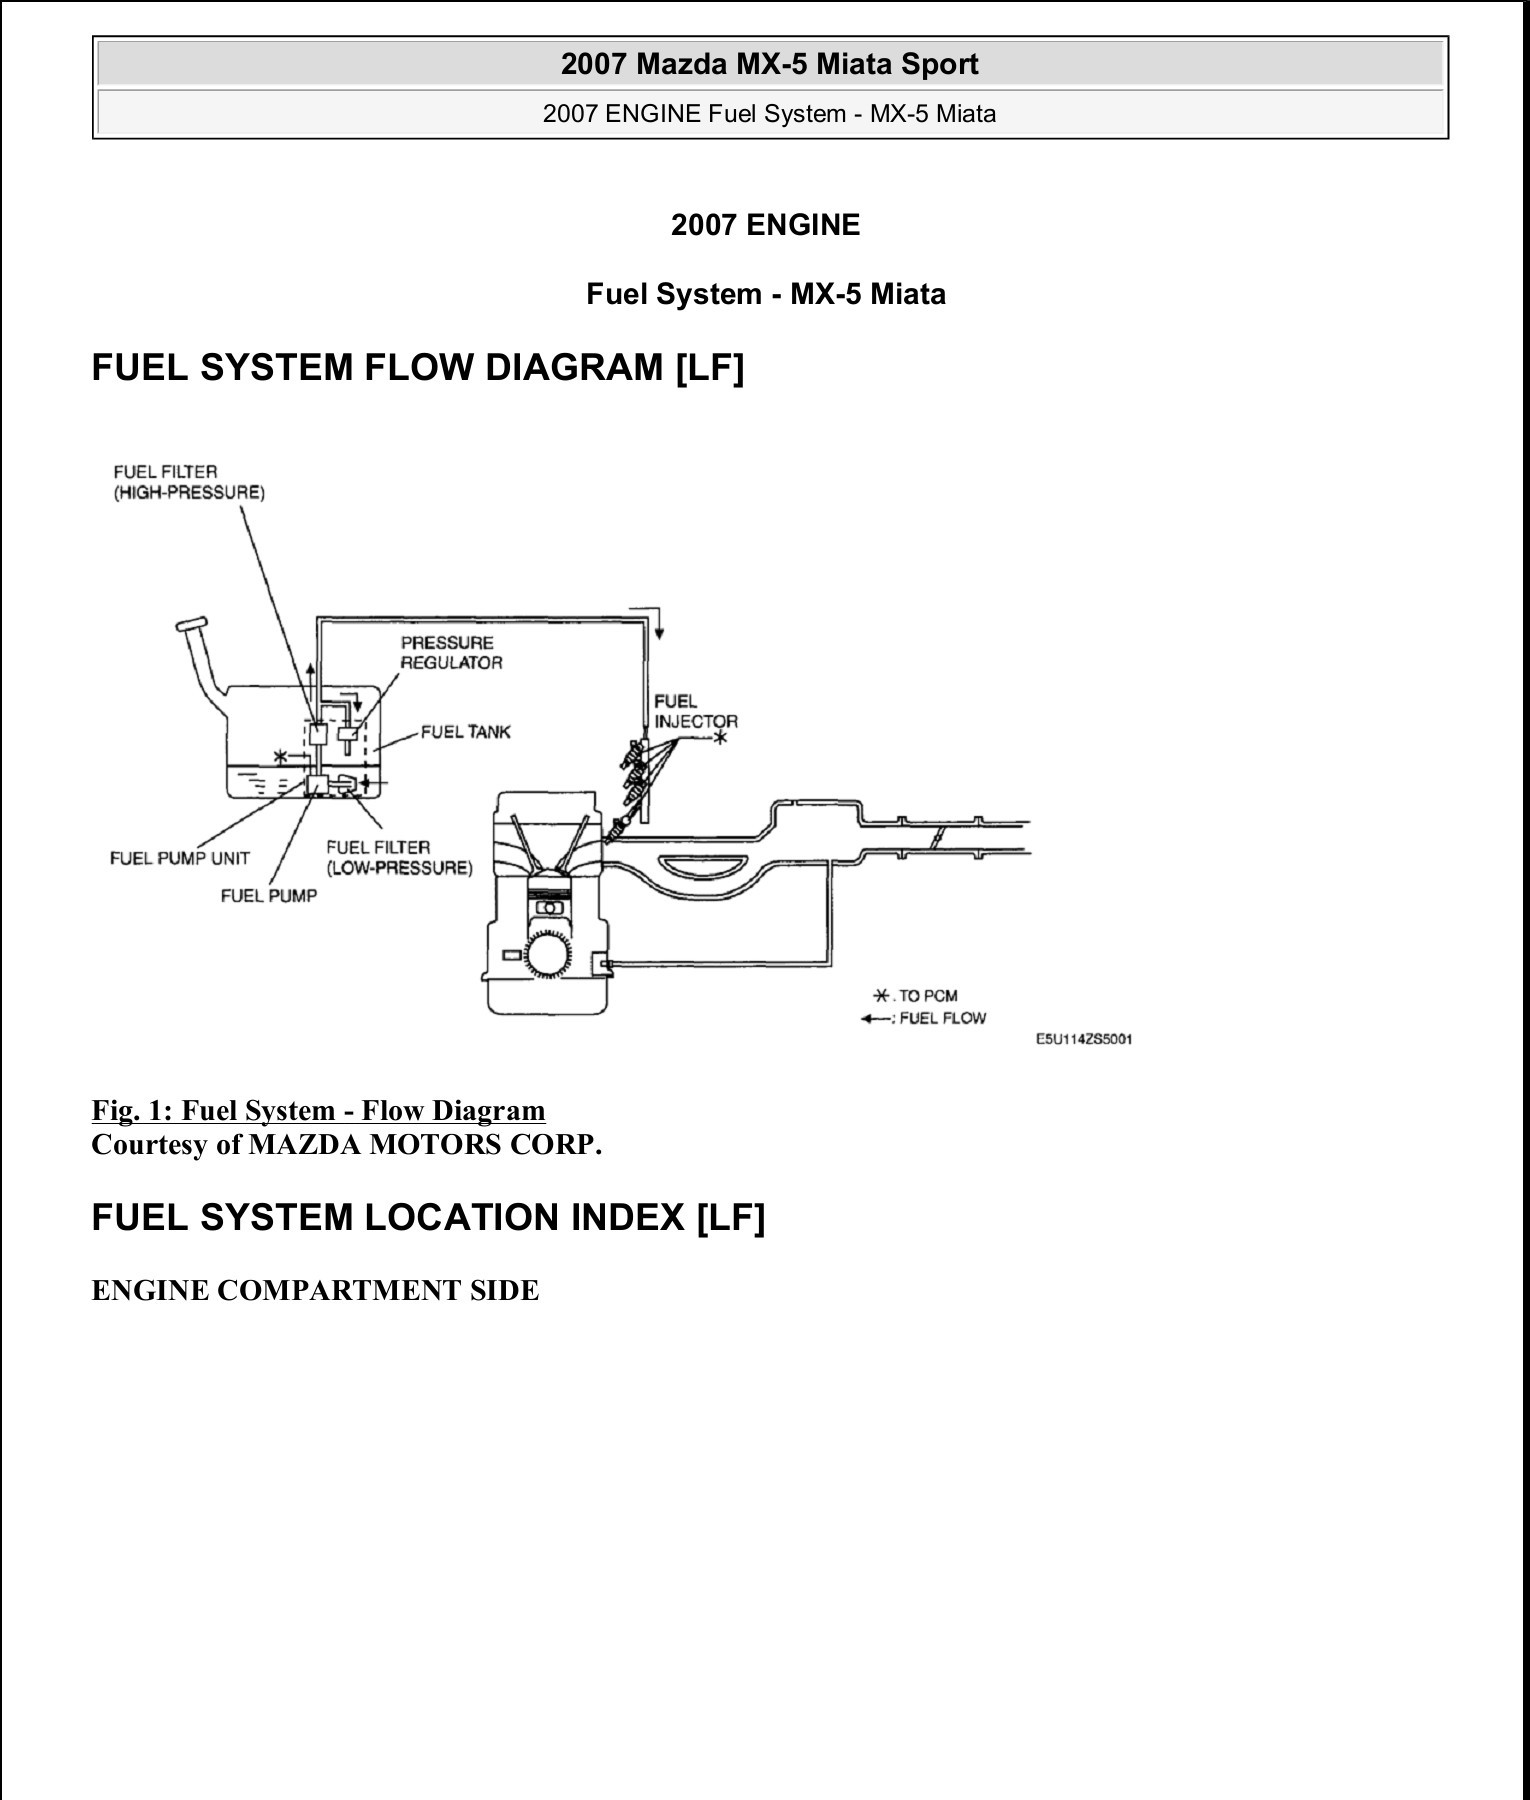 hight resolution of mazda fuel pressure diagram wiring library fuel system flow diagram lf mellens net